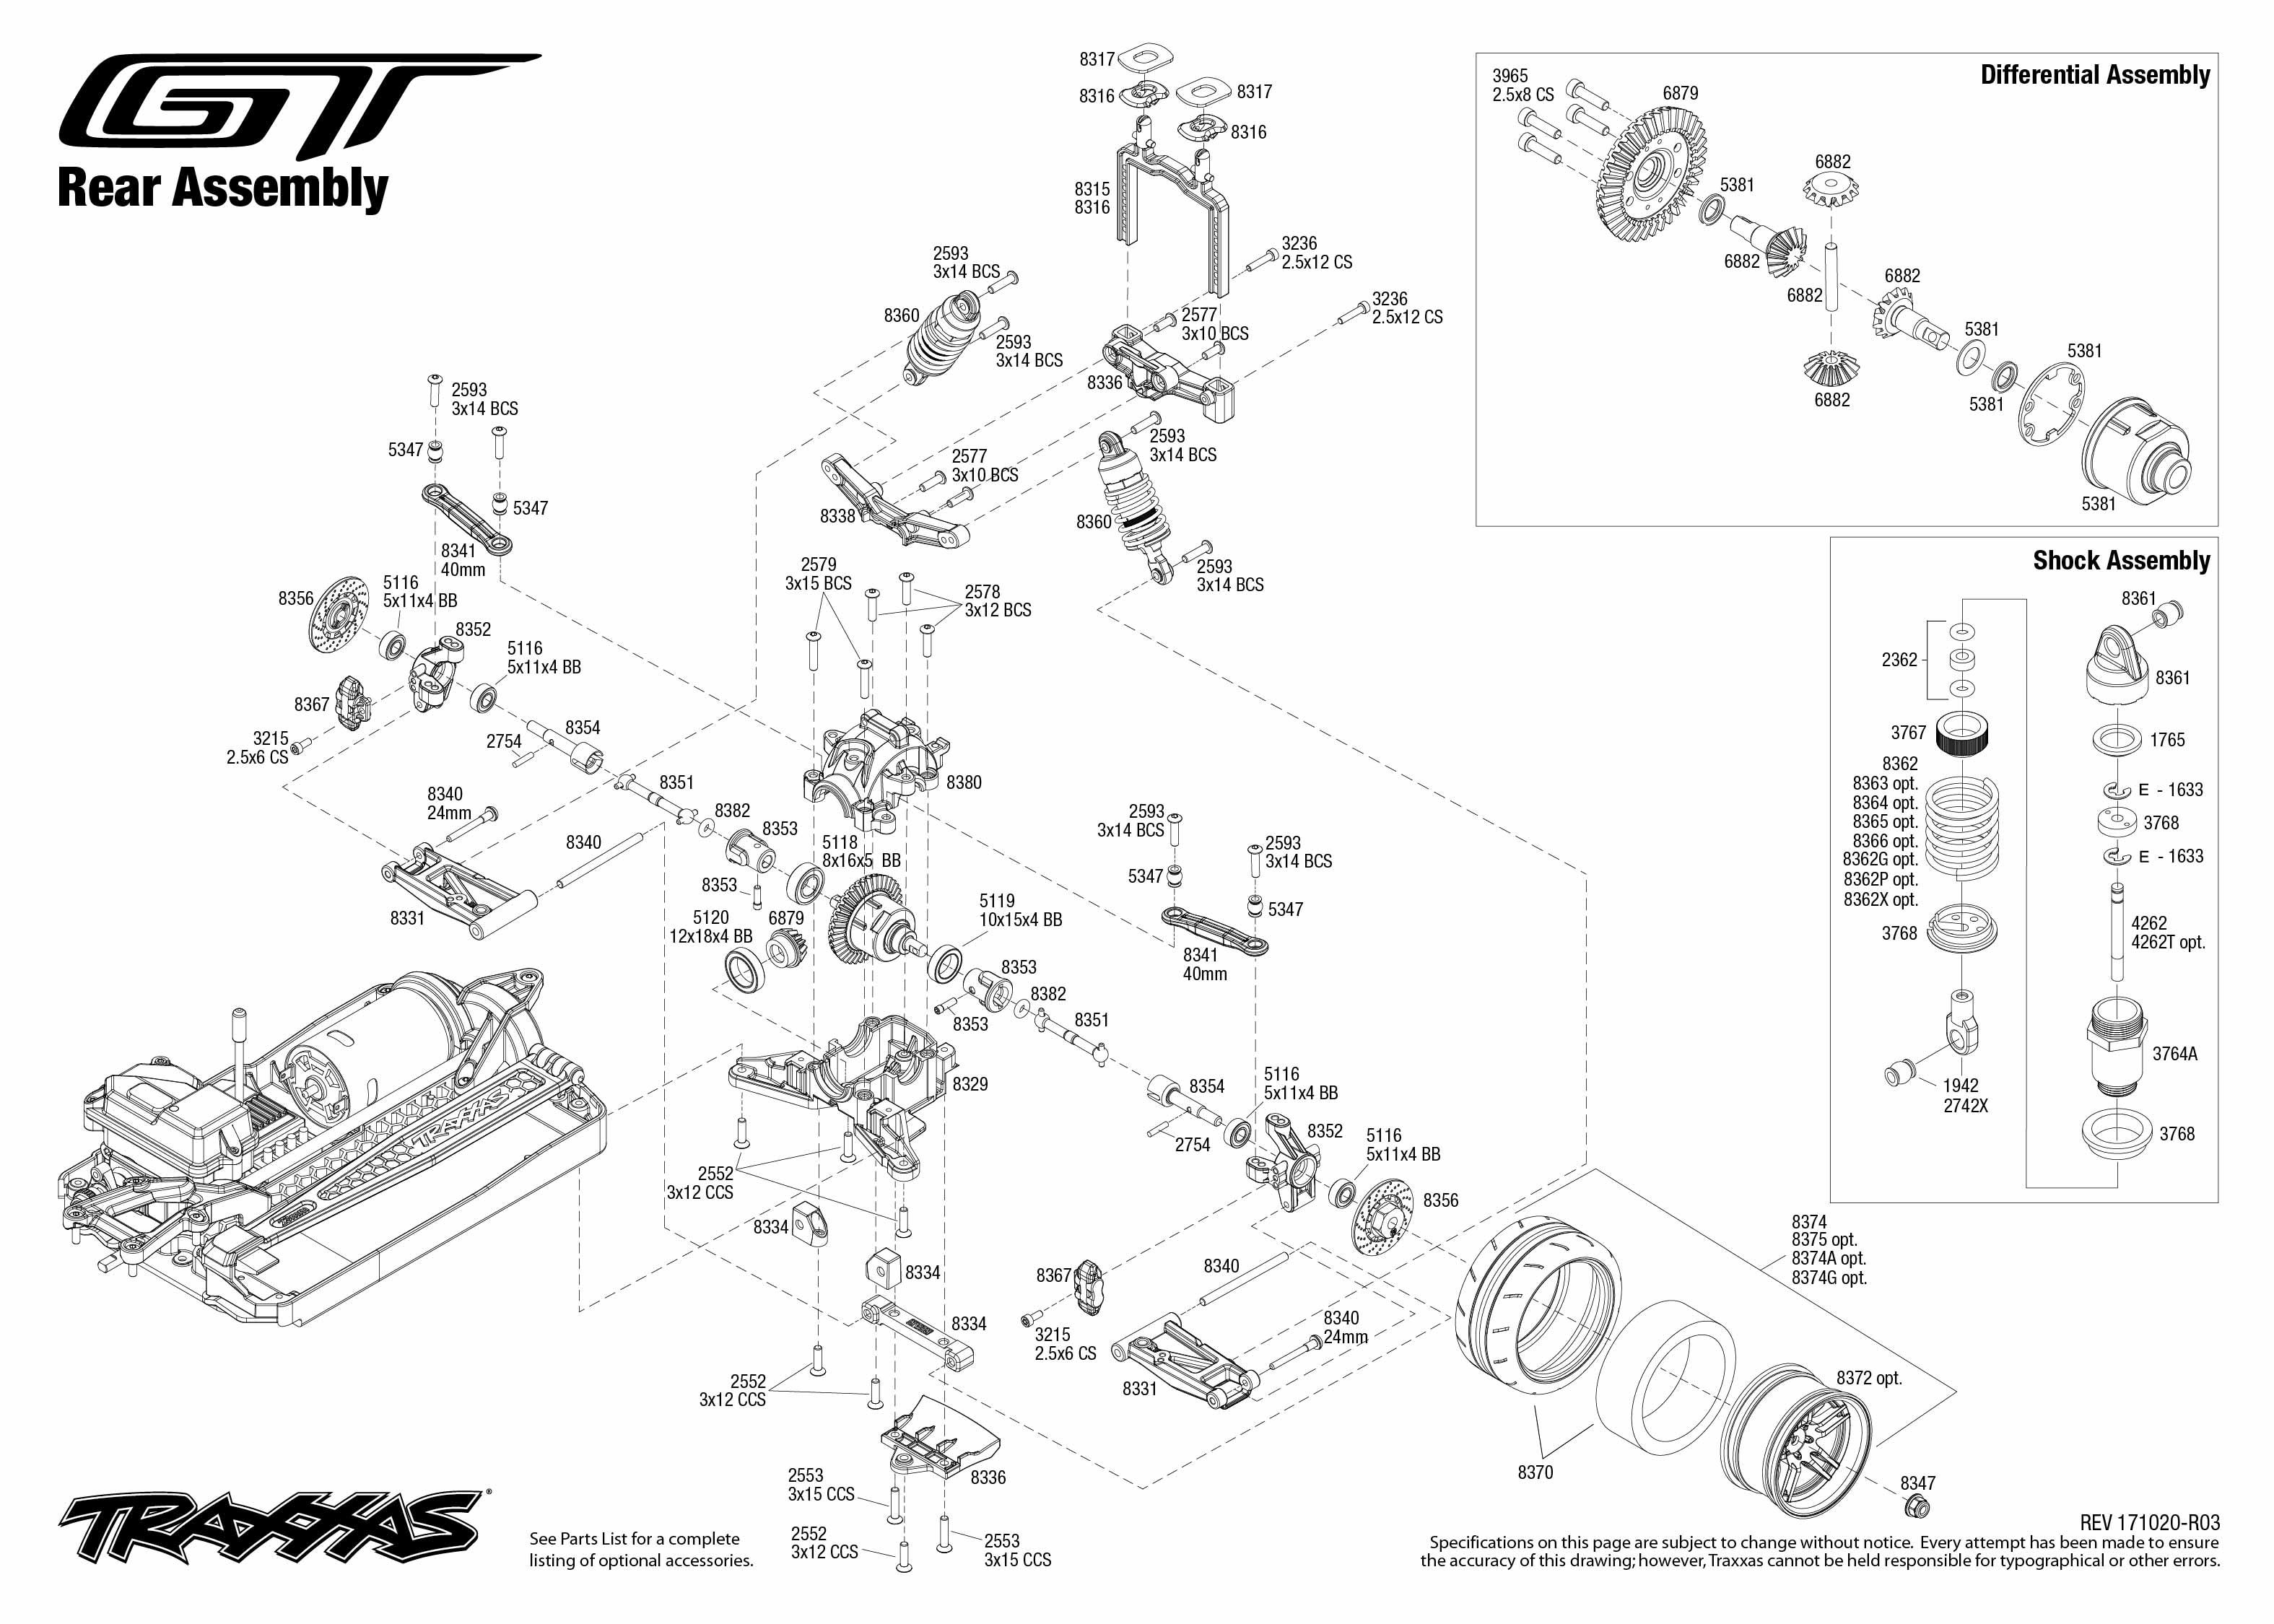 Harley Chopper Wiring Harness Kits Harley Sportster Wiring